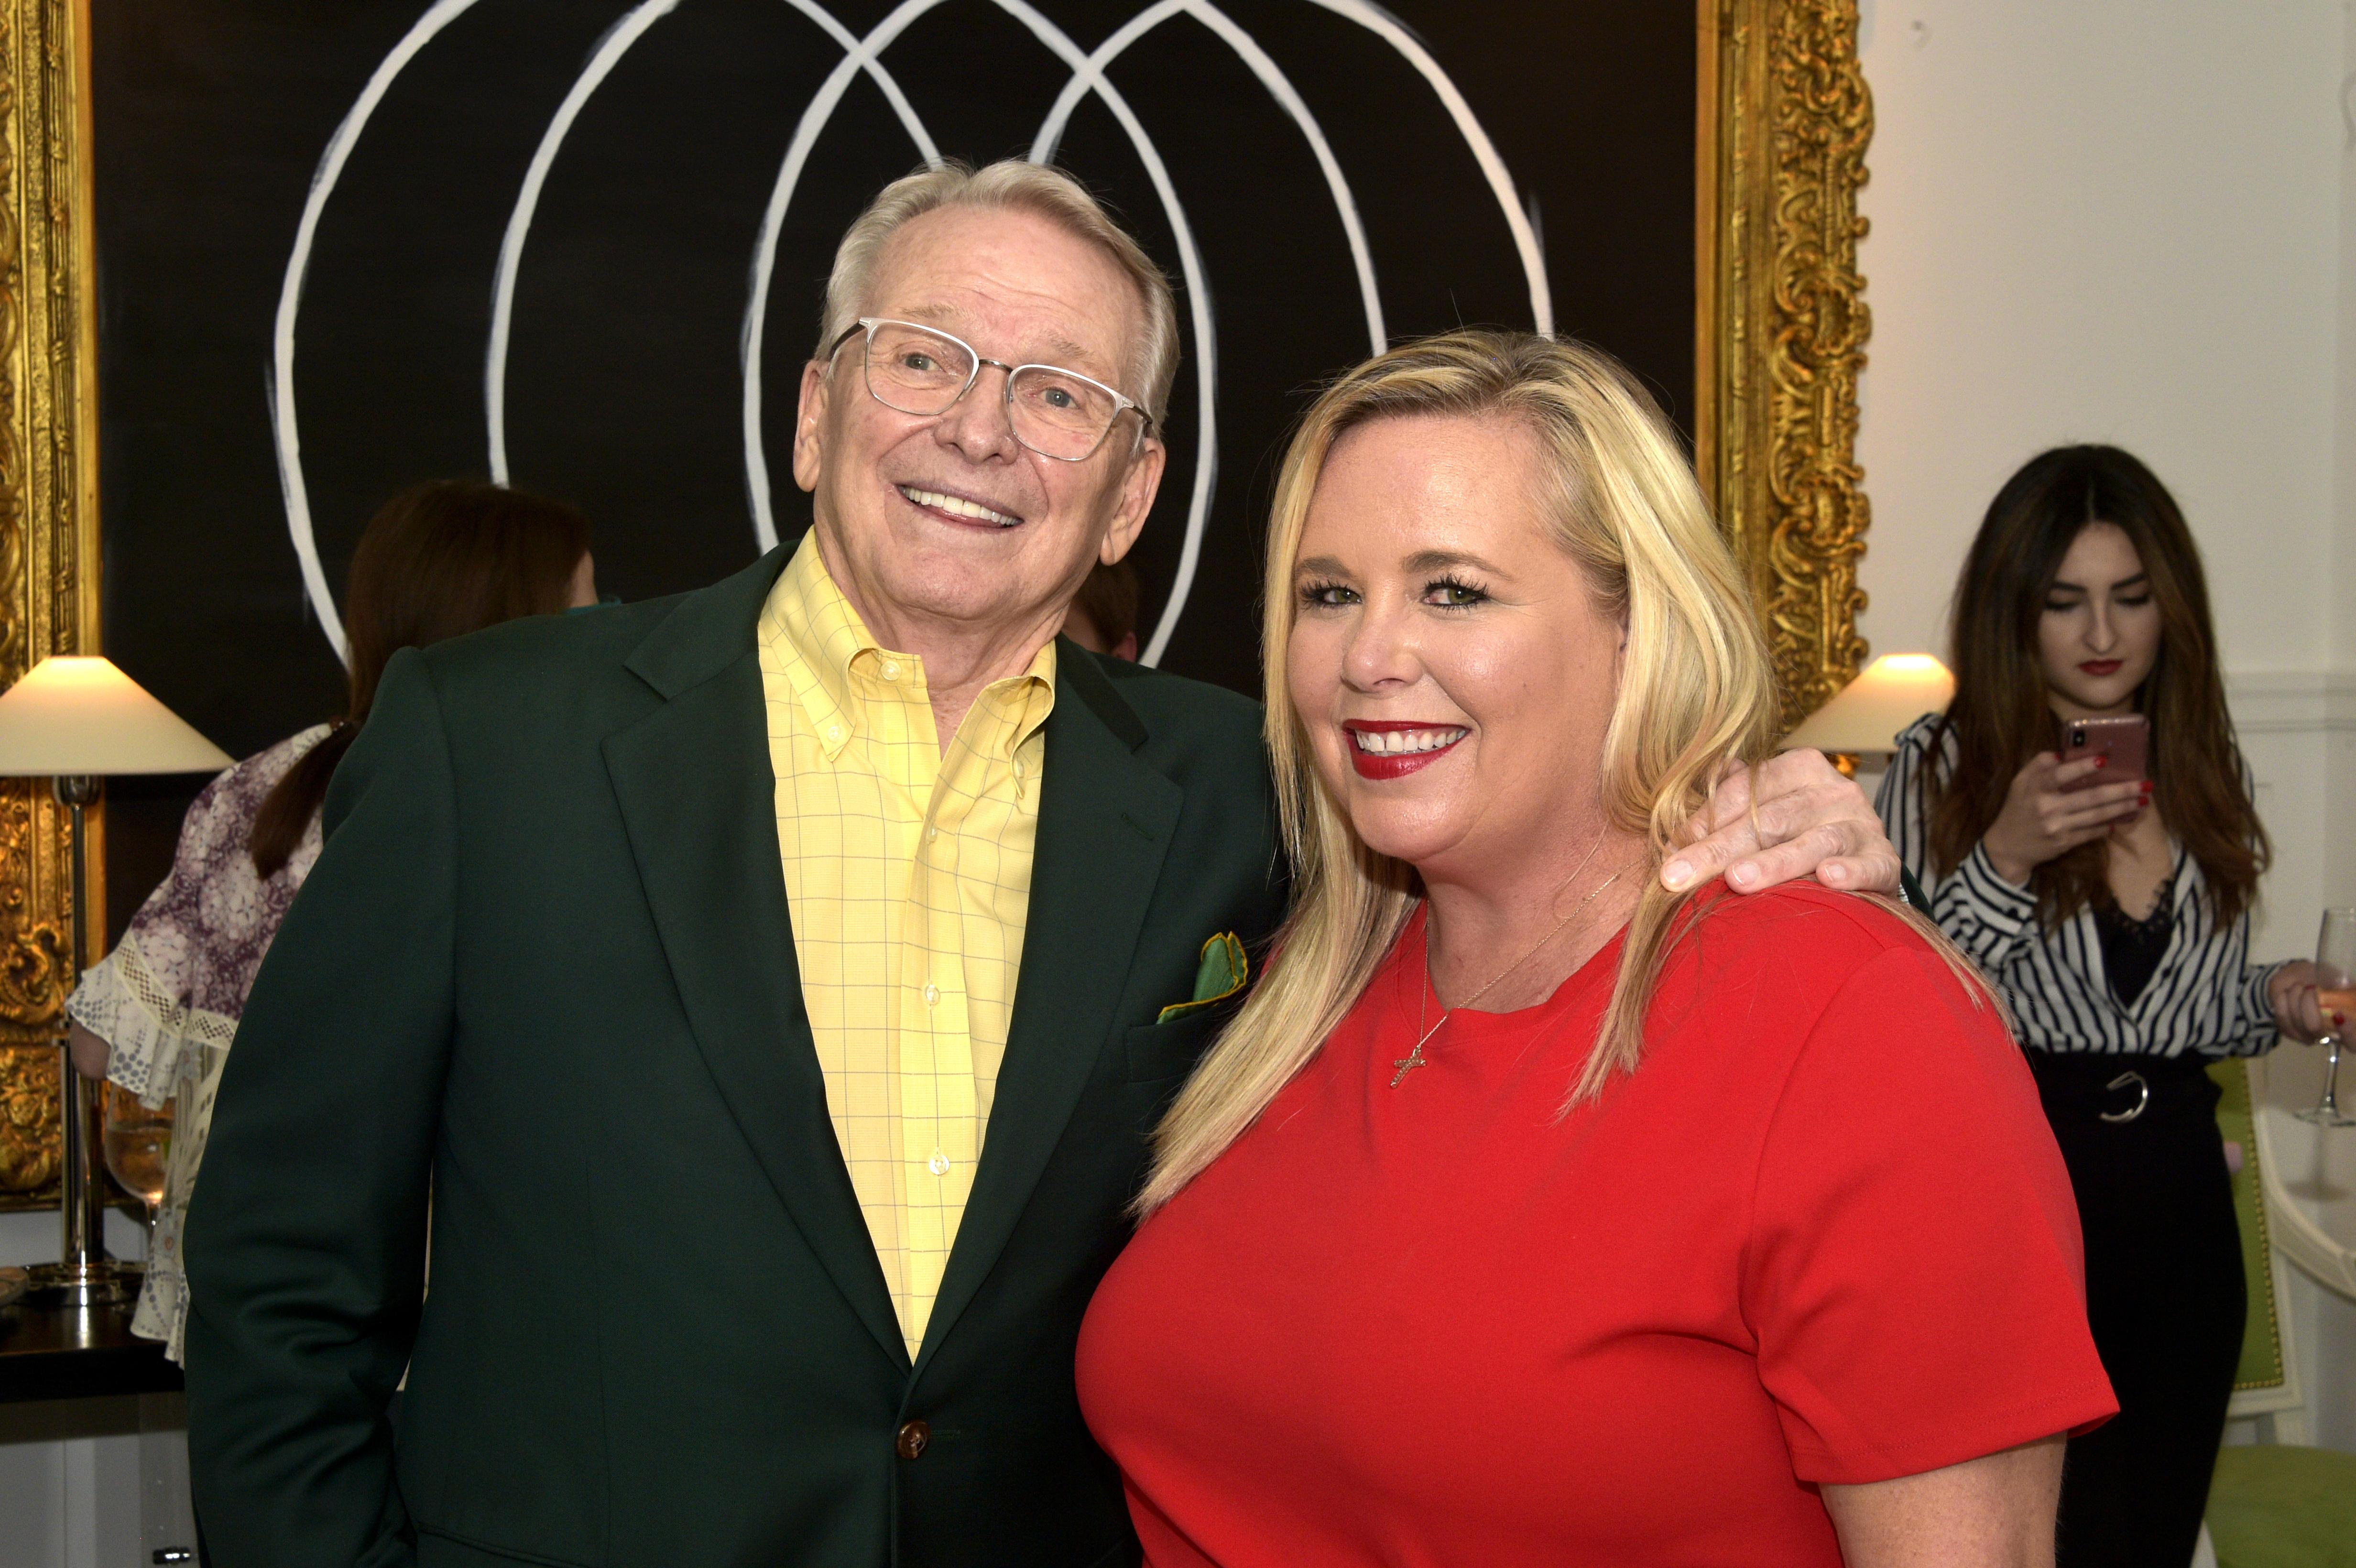 Bob Mackie and Amy Garcia